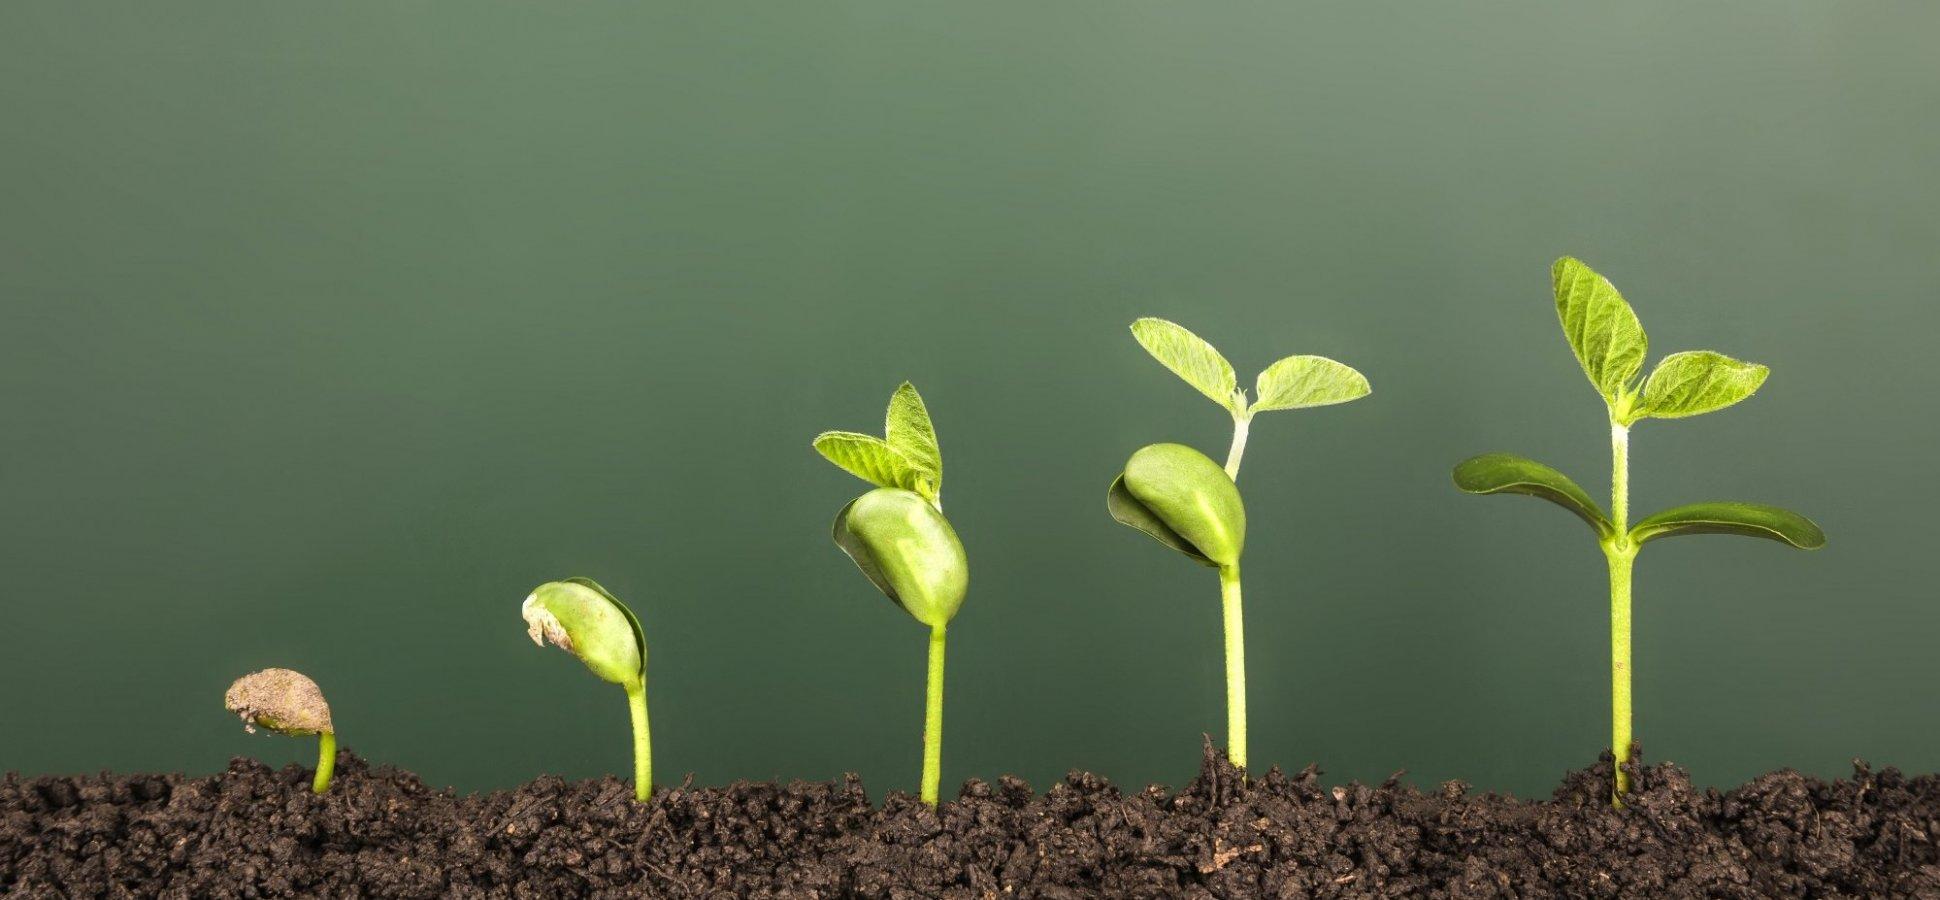 Growth Hacking vs. Behavioural Design